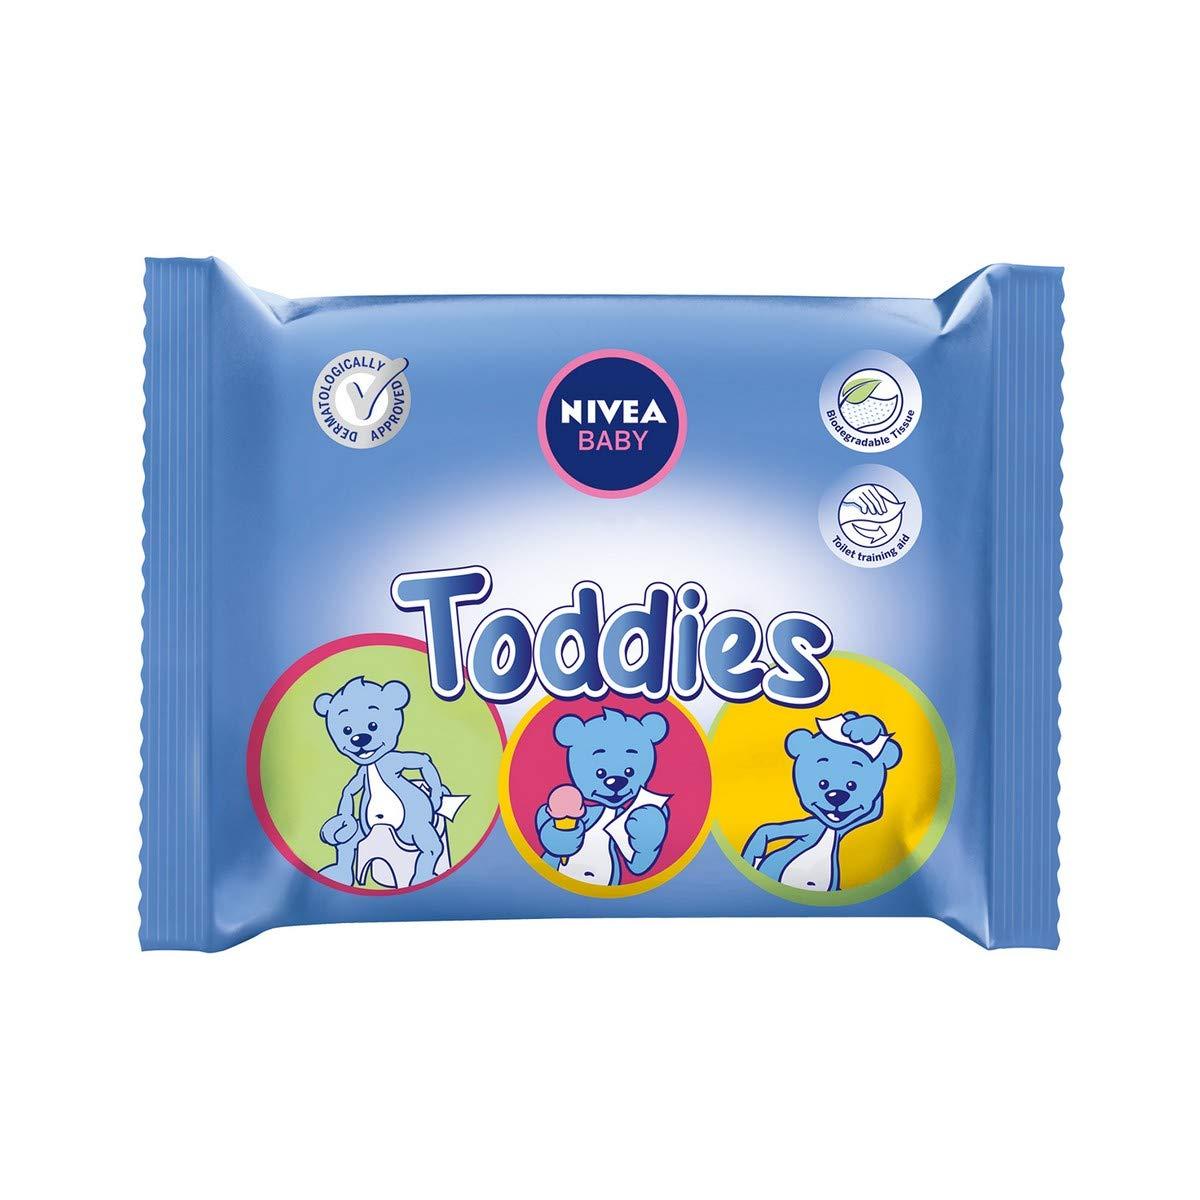 Nivea Baby Lingettes Multi-Usages Toddies x 60